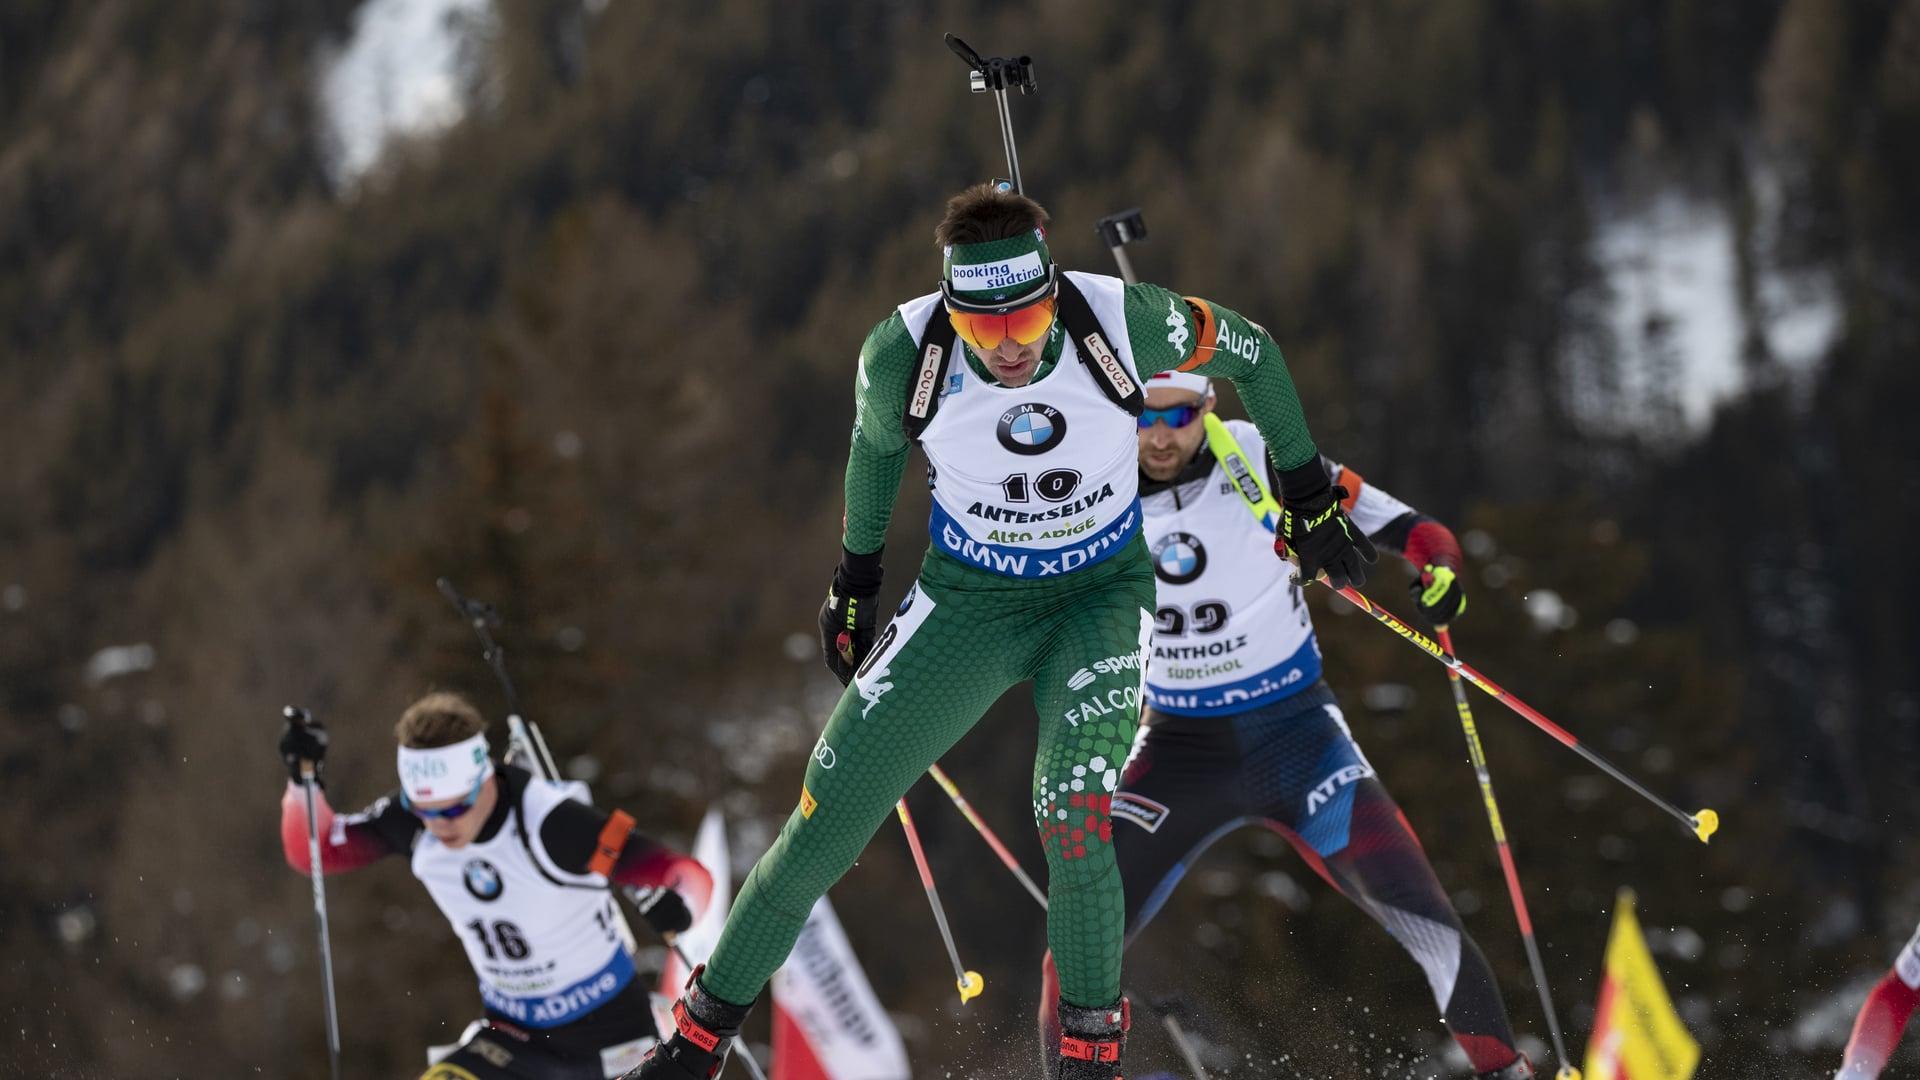 Italian Biathlon Cup<br />22.-24.03.2019